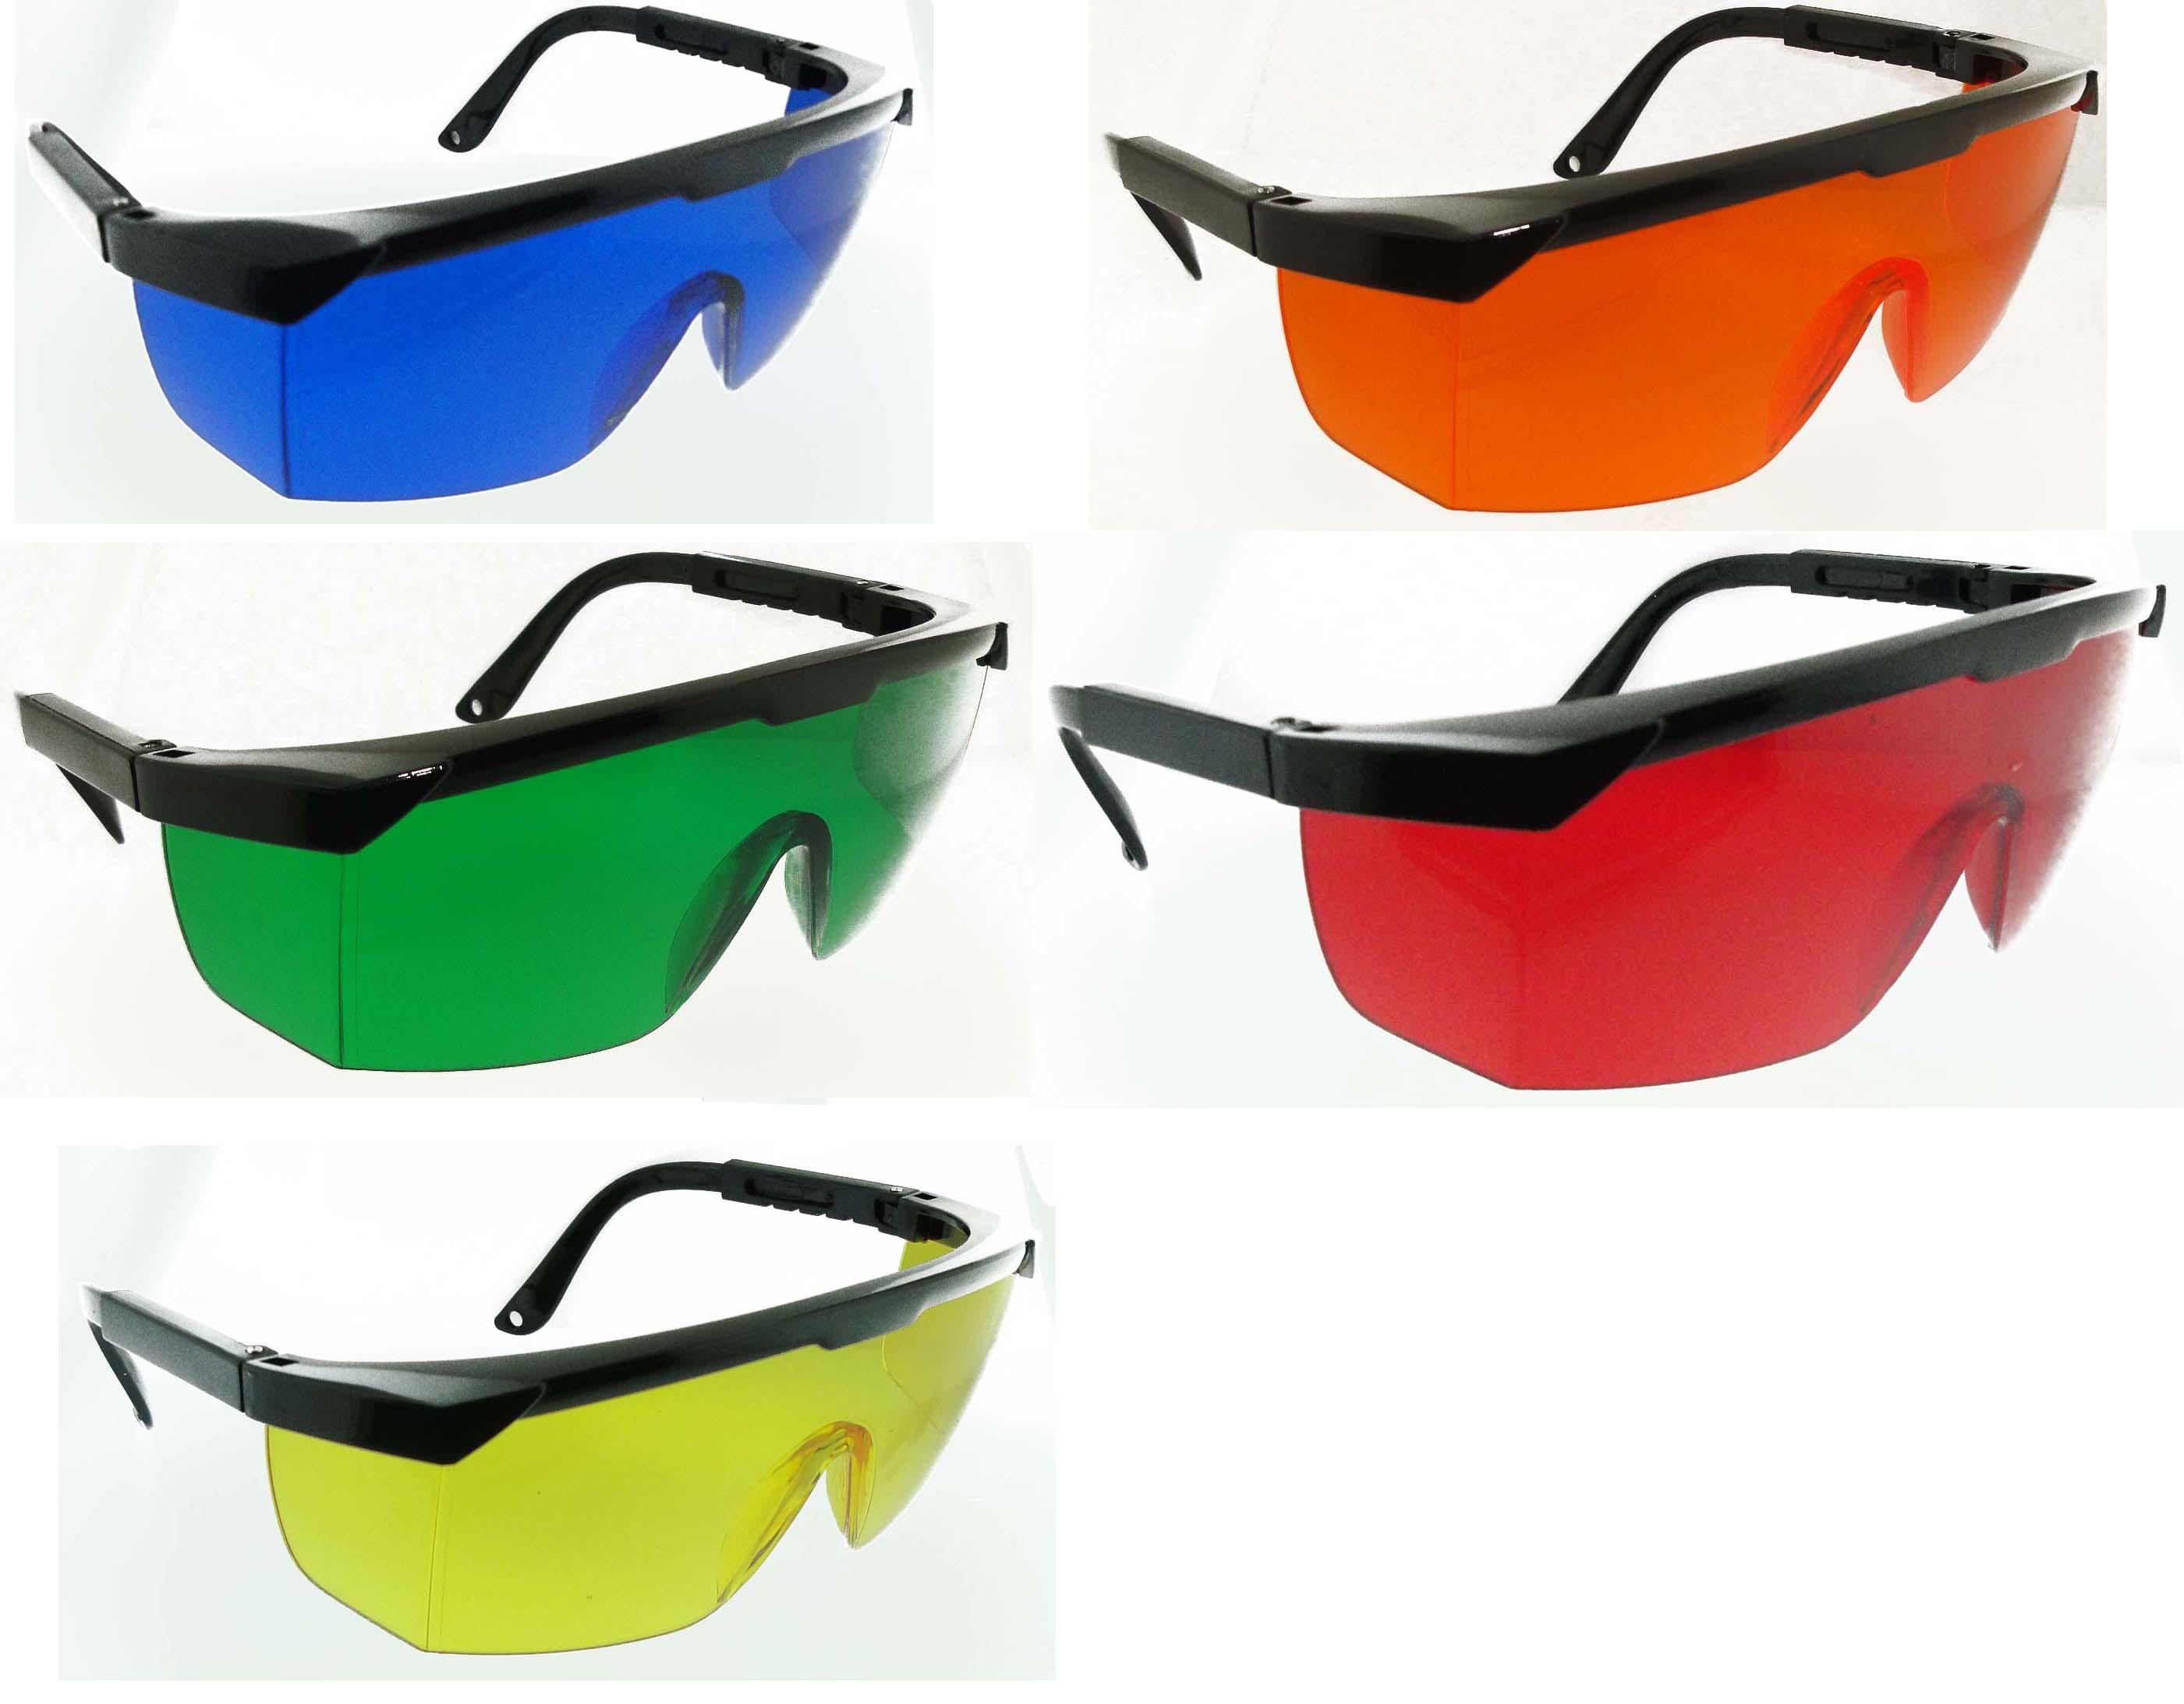 3354f8e39c7 Uv Sunglasses Test « One More Soul